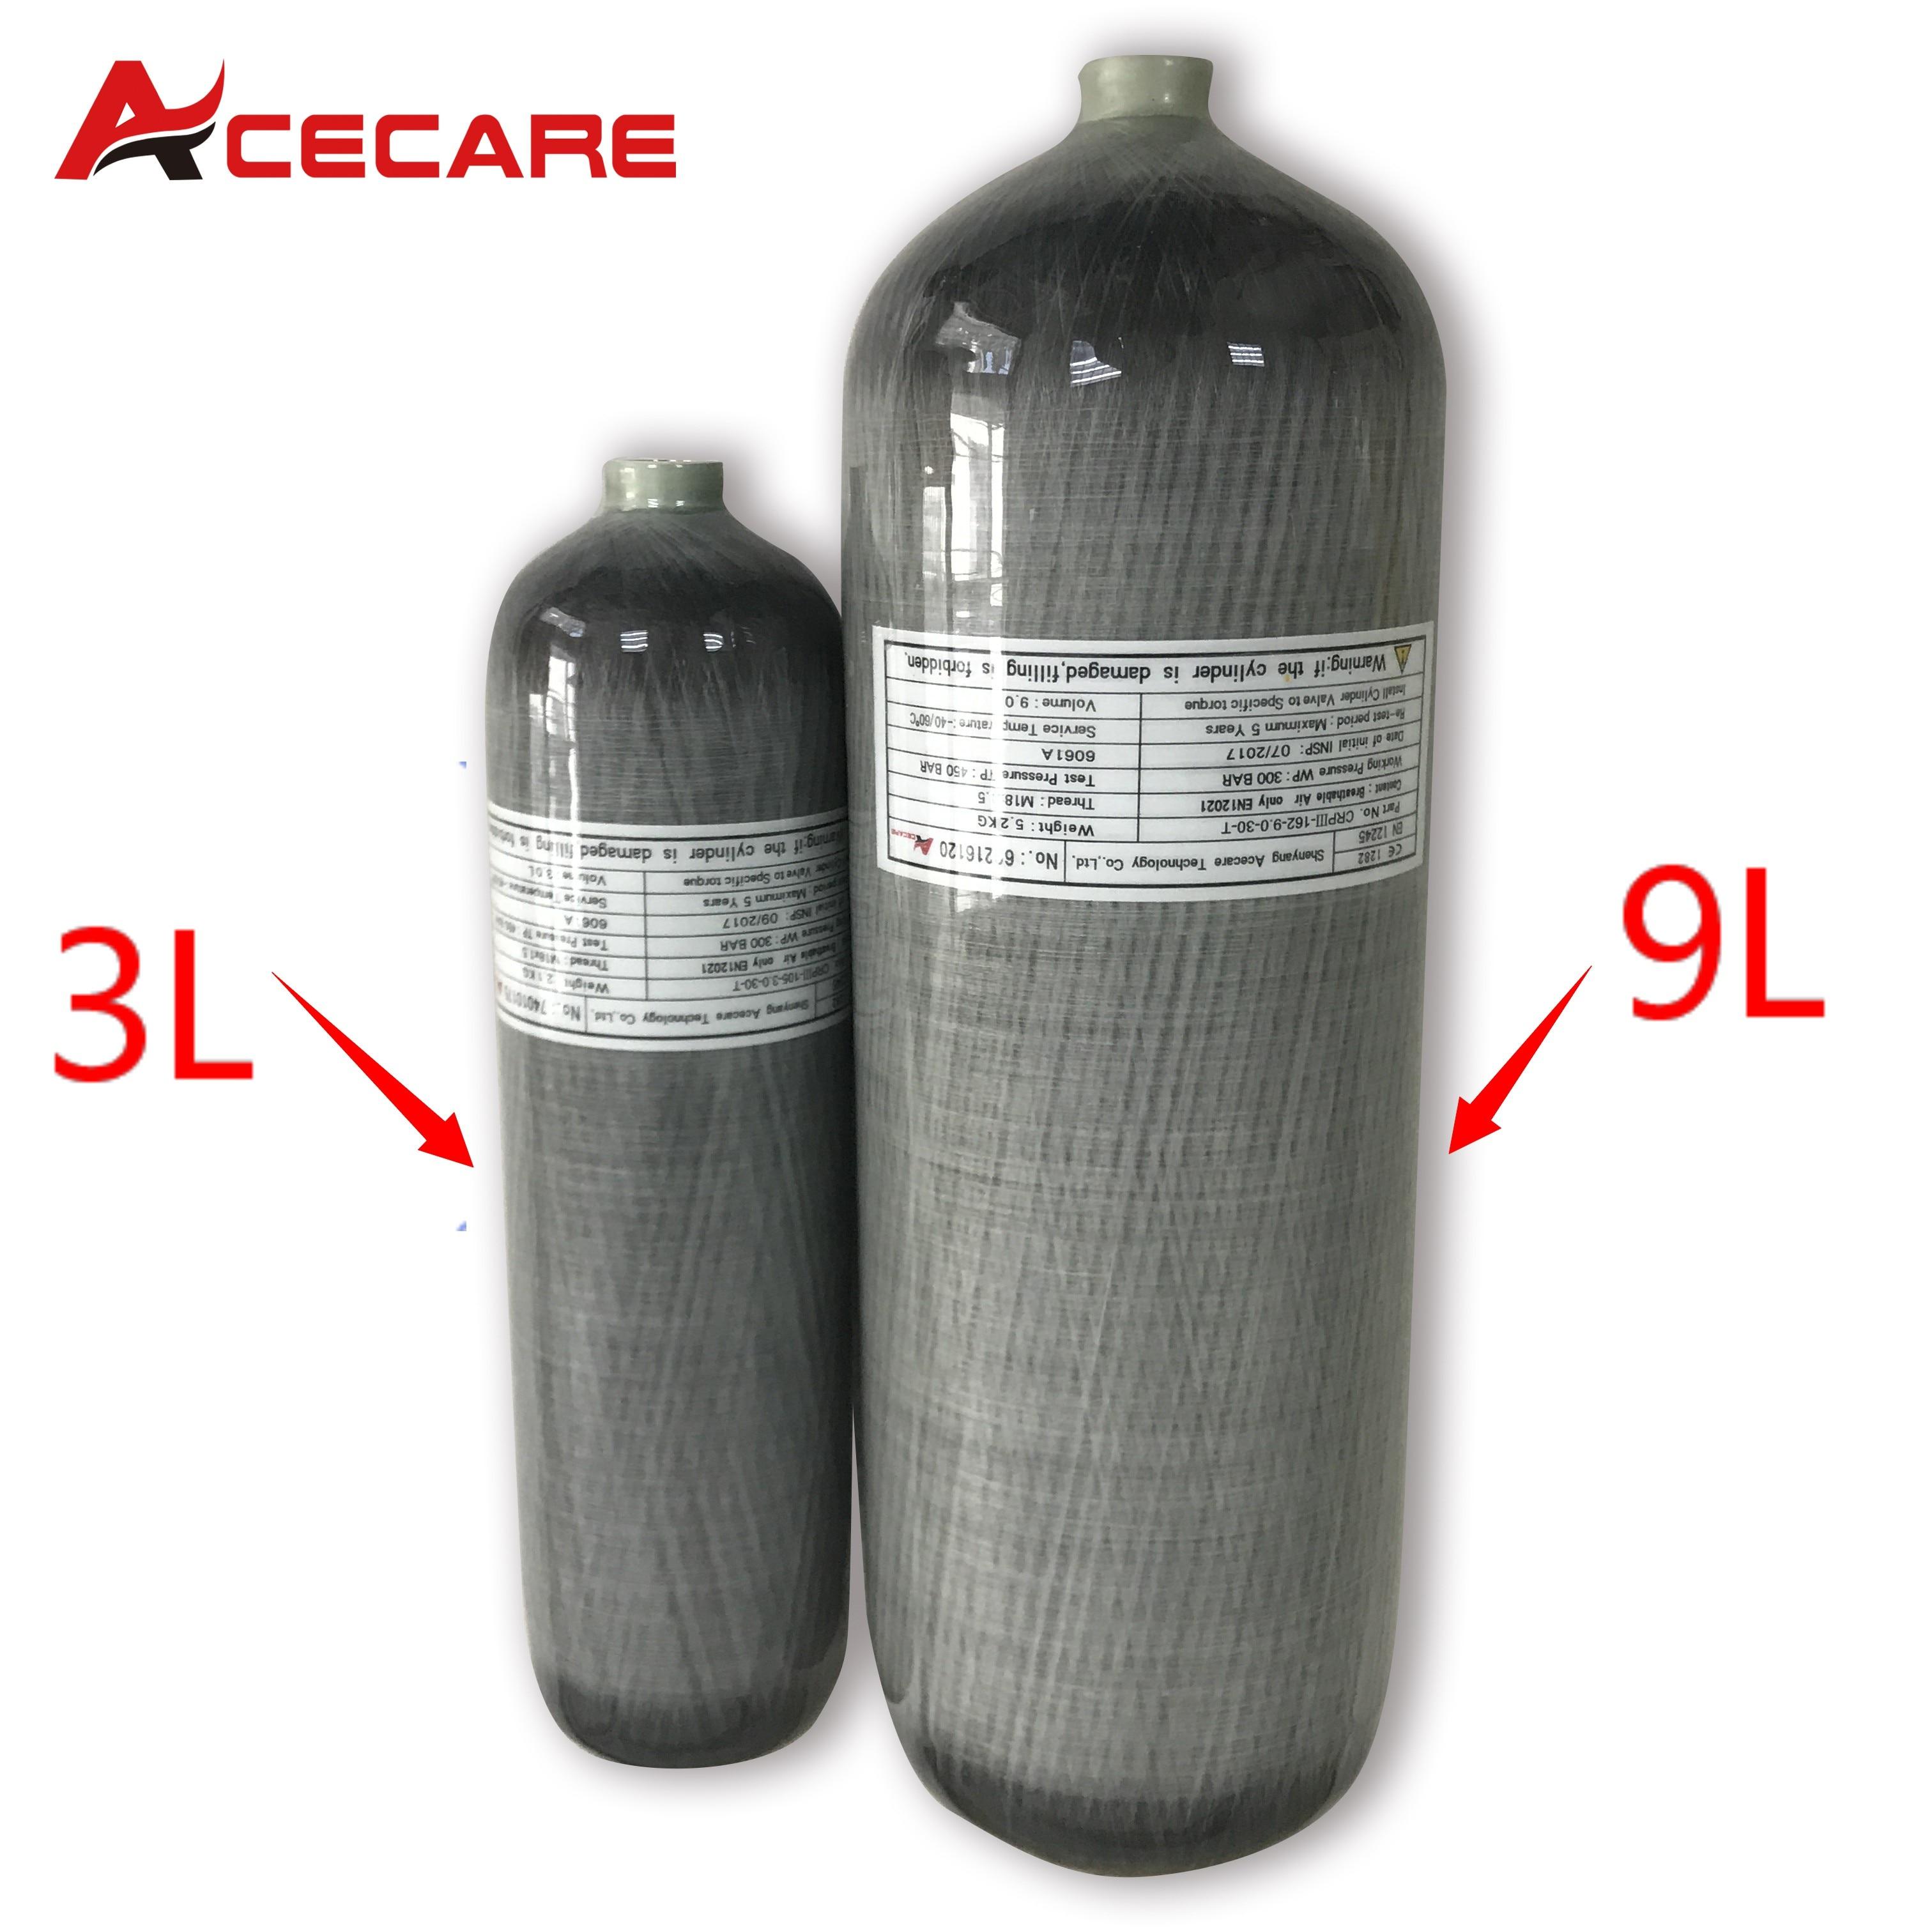 Acecare Pcp Air Rifle Cylinder Carbon Fiber 3L/9L 4500Psi Tank Compressed Air Guns To Hunt Air Rifle Speargun Spearfishing Pcp